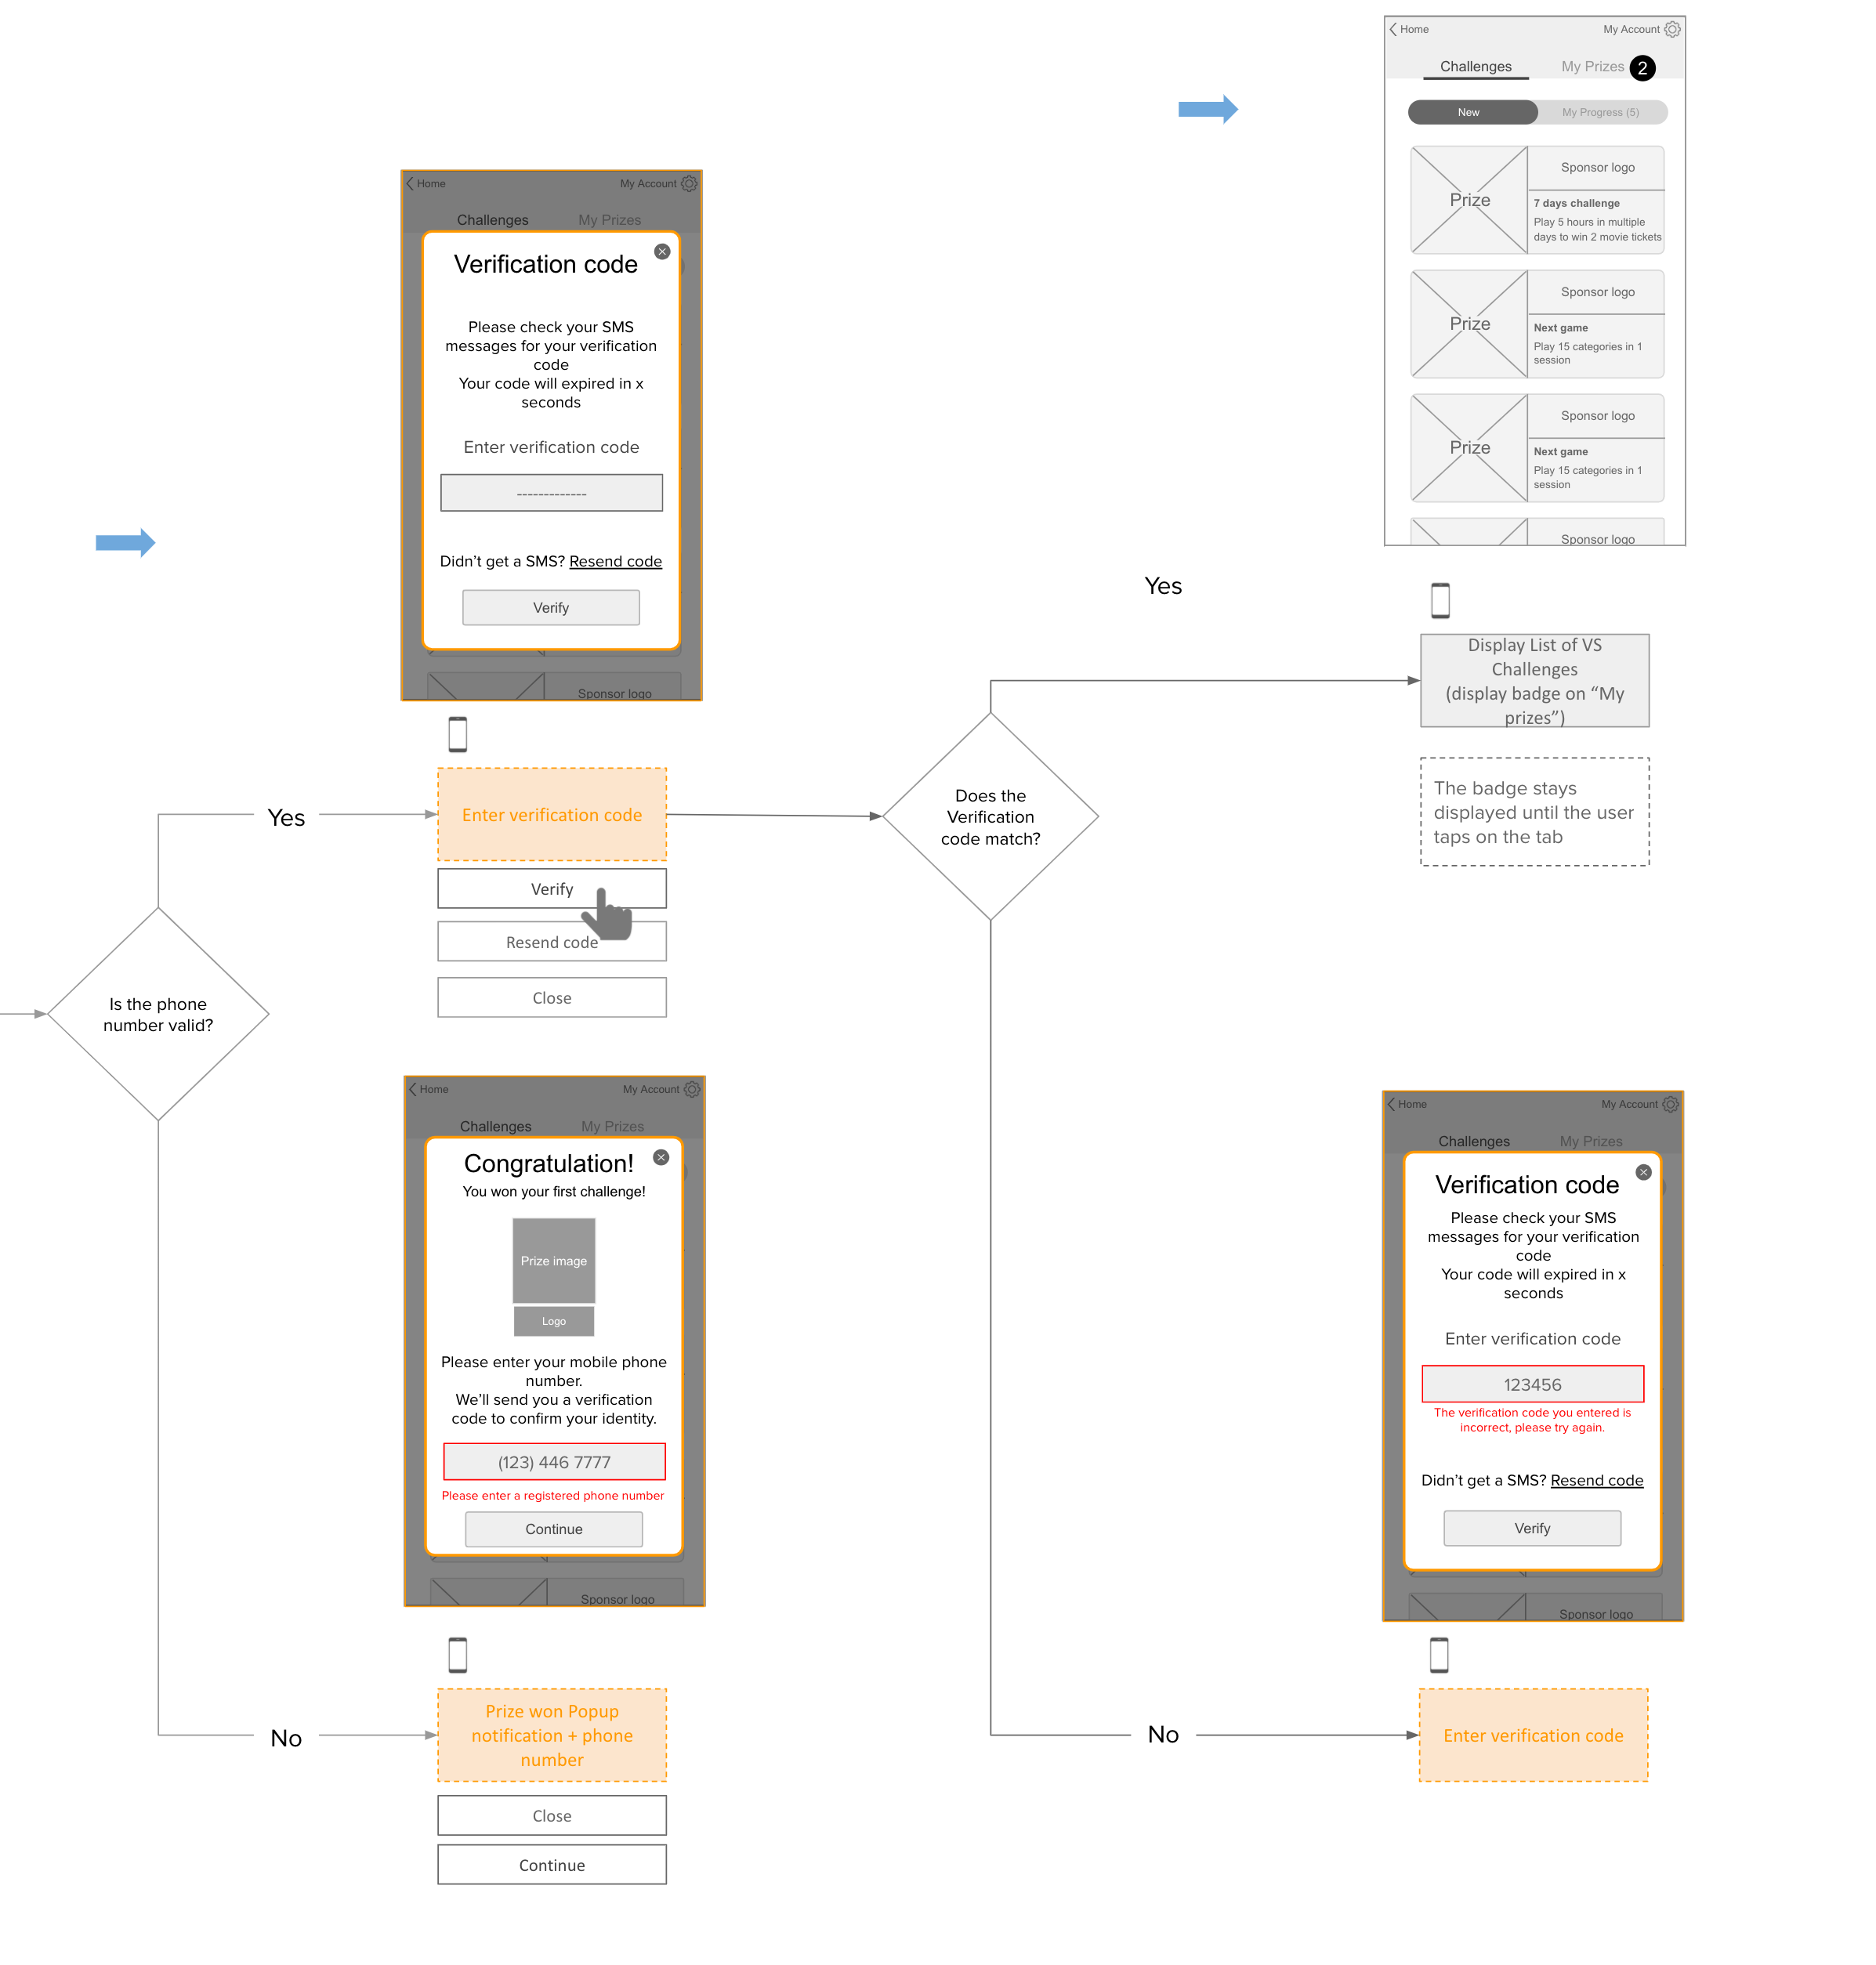 Flow for the verification process.